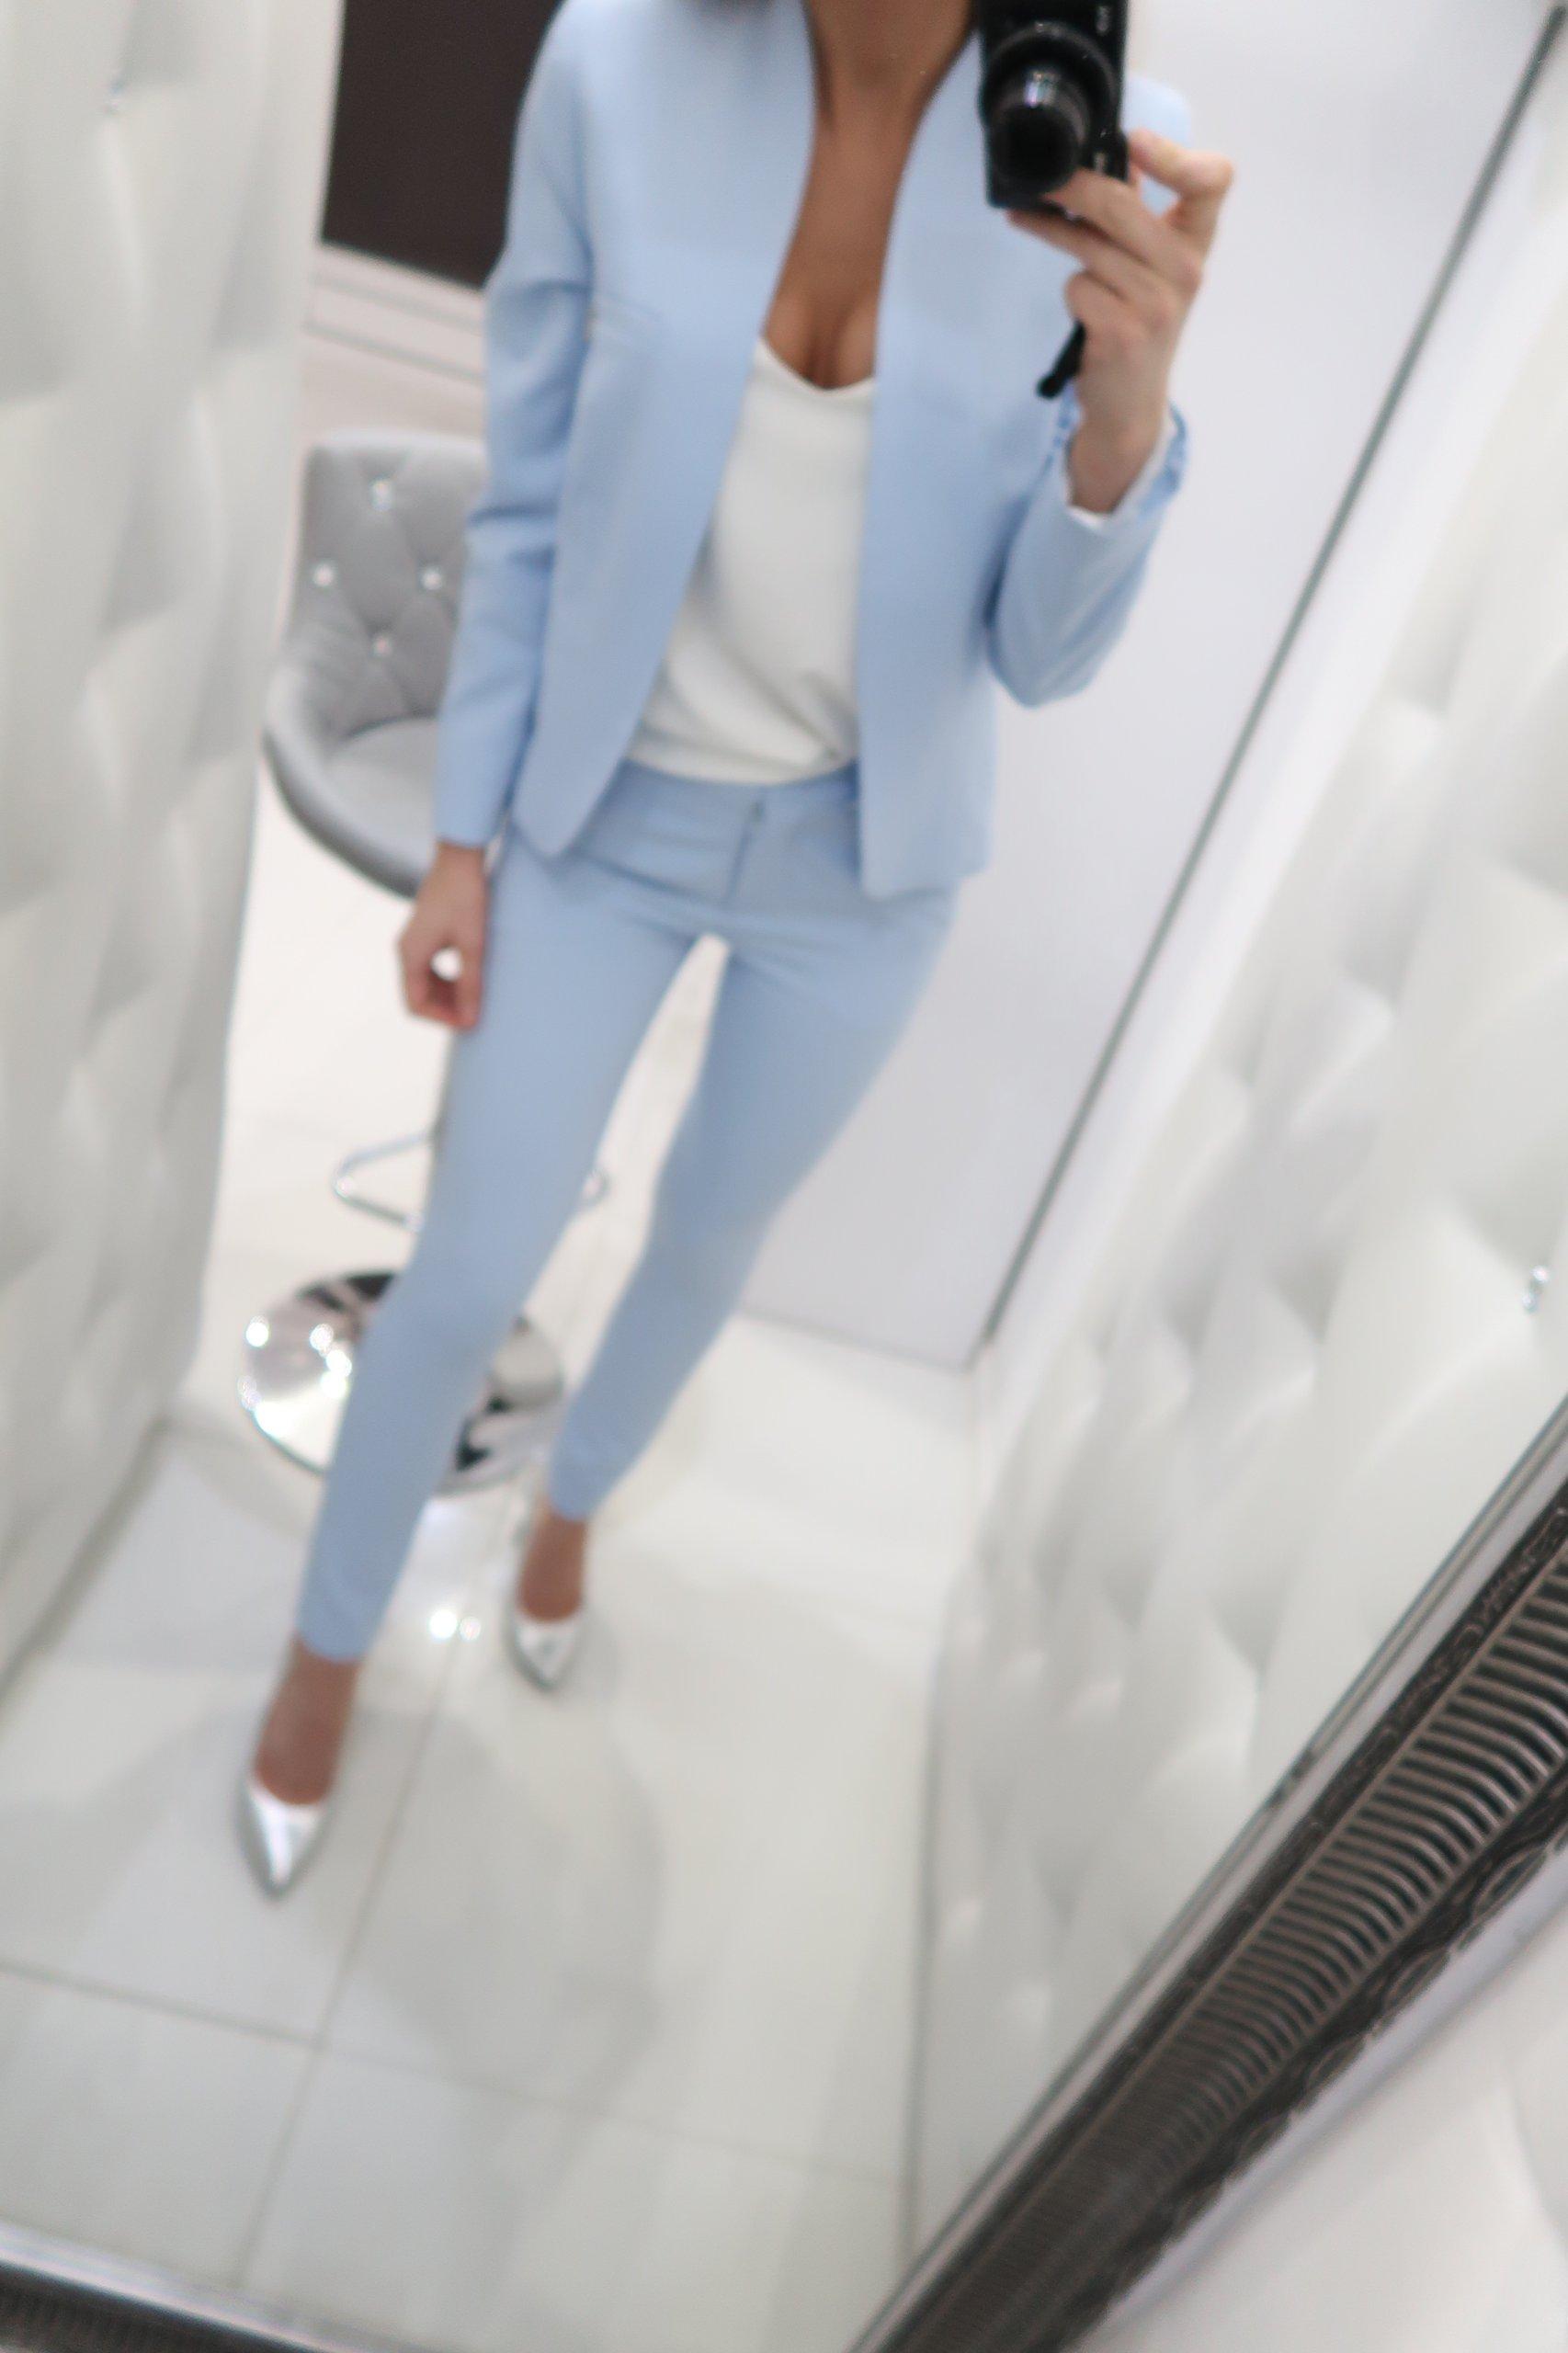 cea9973924 garnitur niebieski elegancki komplet kostium 36 - 7298959897 ...